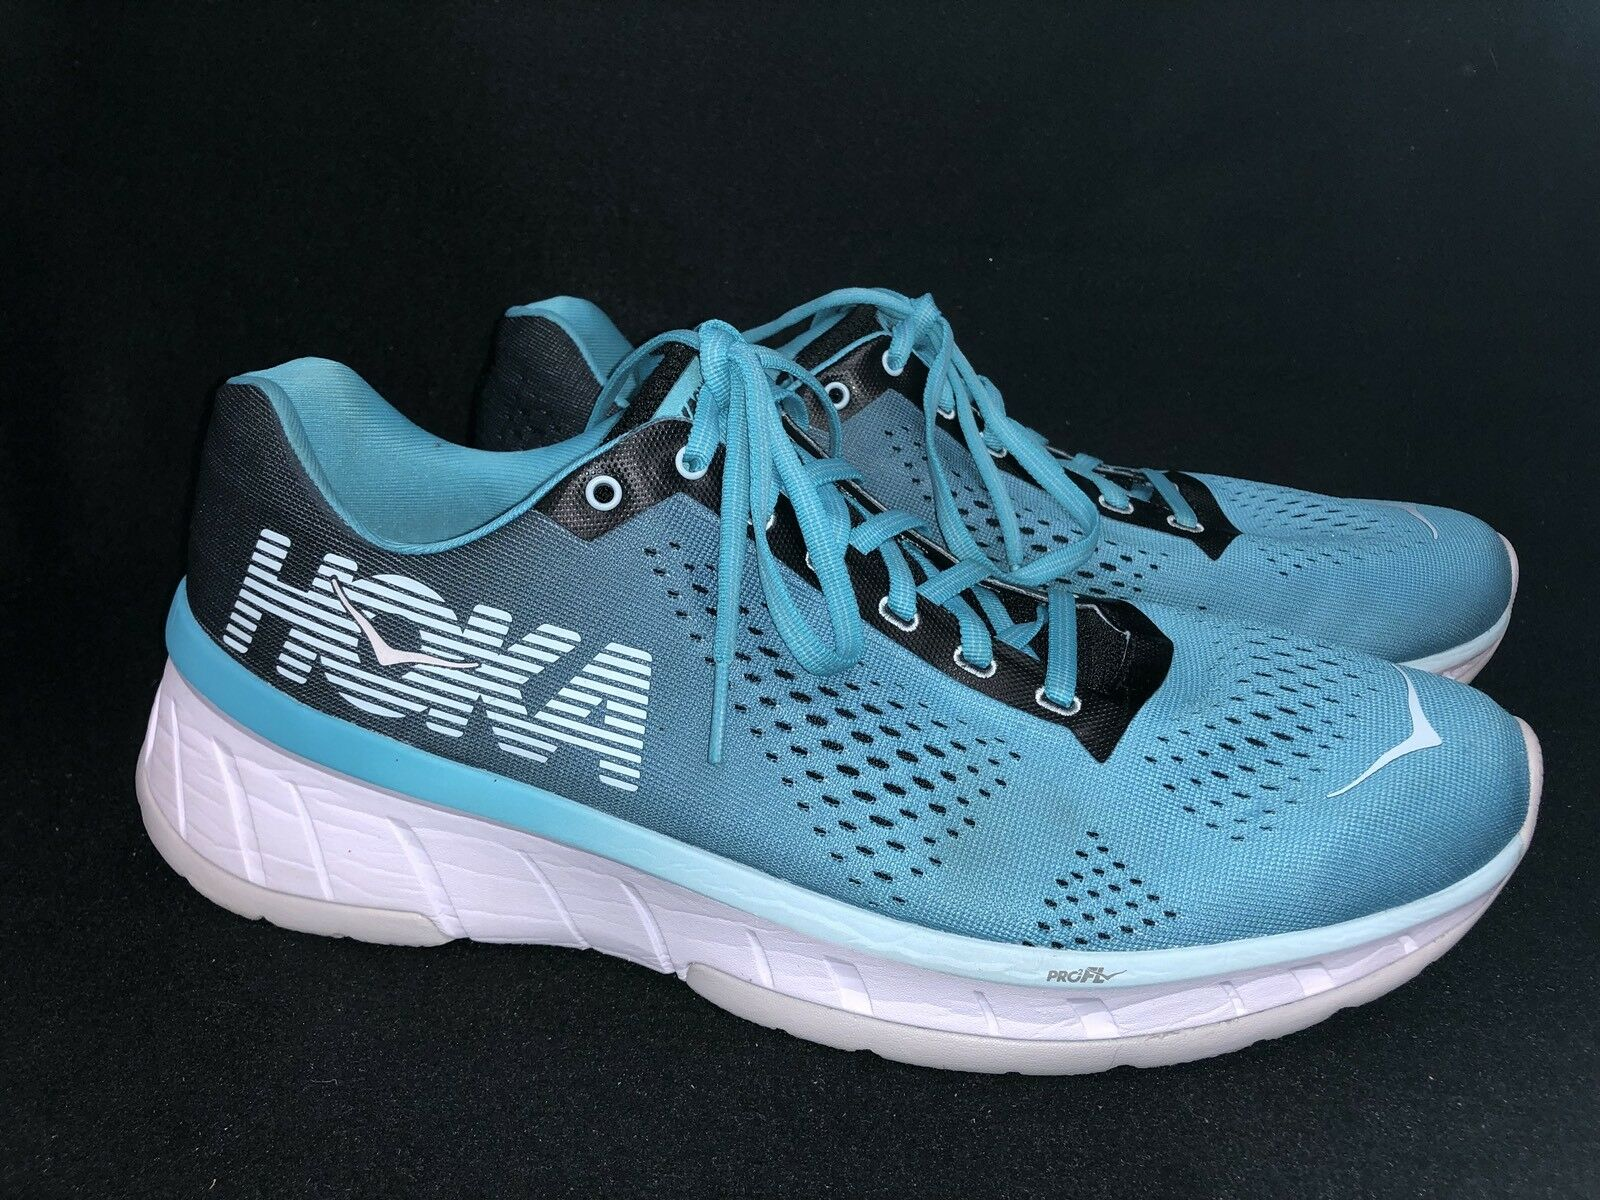 Hoka One One HIBISCUS Cavu VINTAGE INDIGO / HIBISCUS One 1019282 Tennis Running schuhe Lace Up b2f1c9